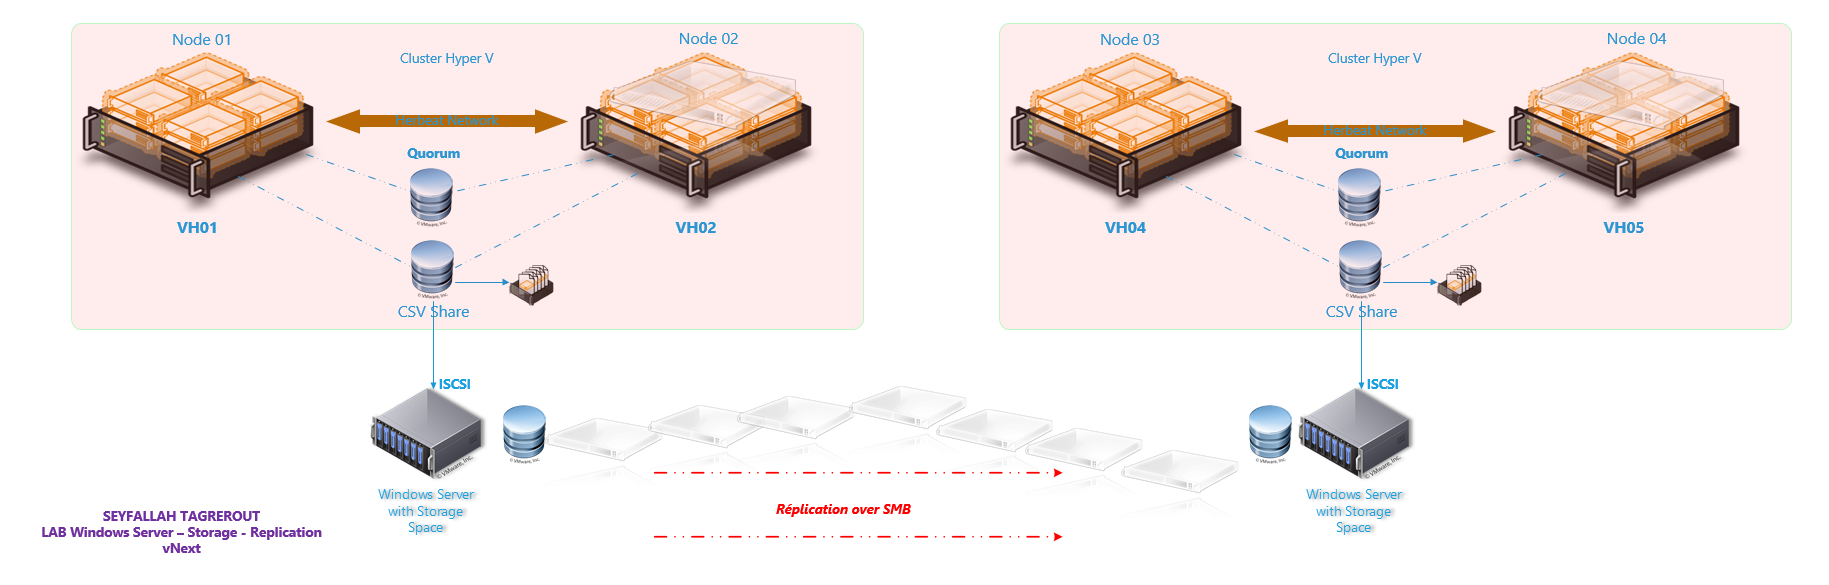 Infra_replication-cluster-cluster